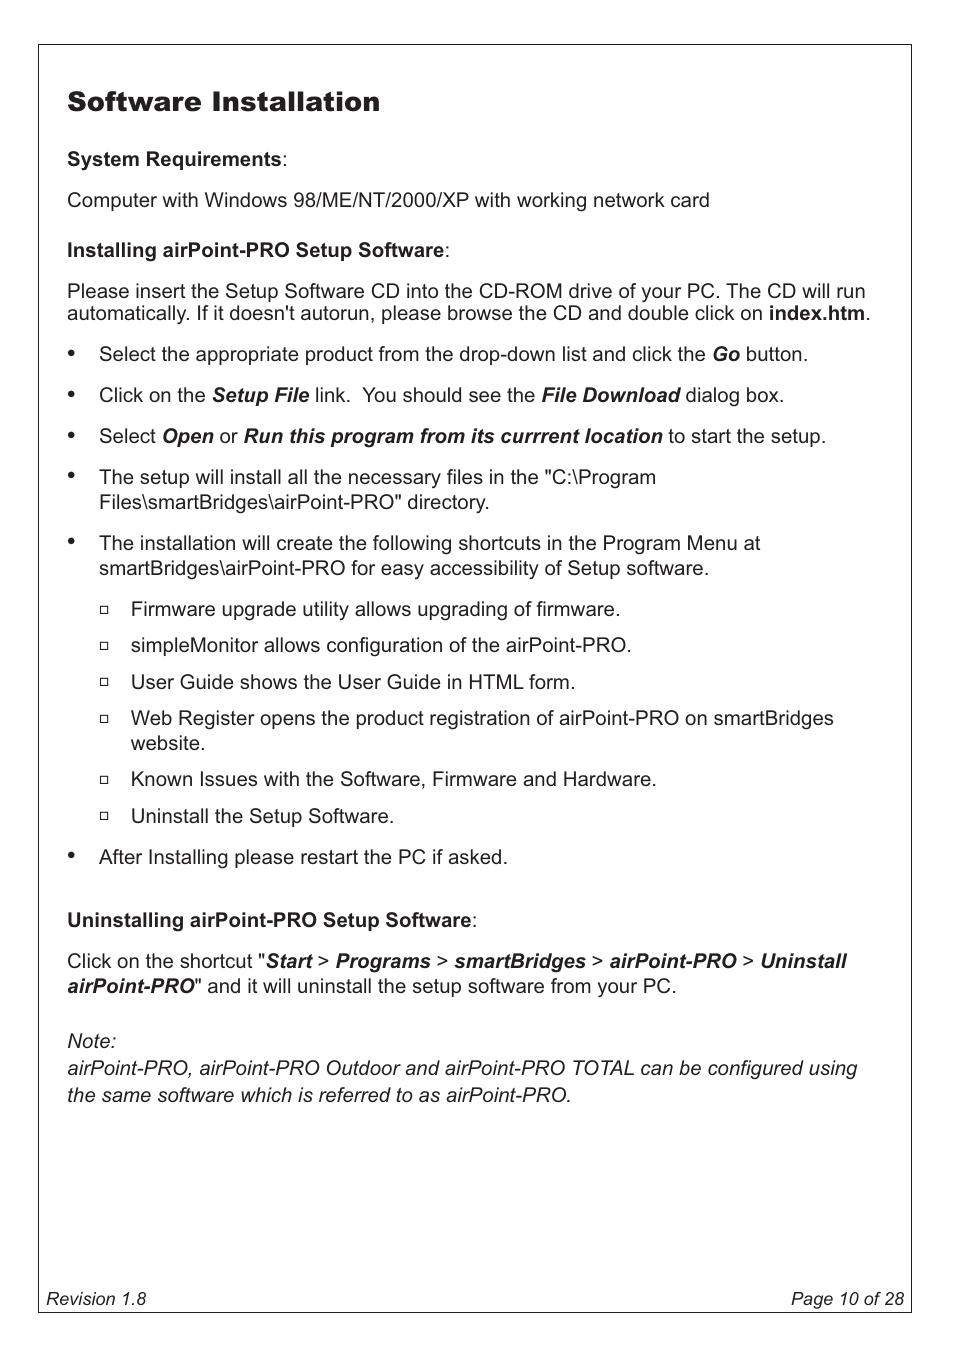 Software installation   SmartBridges airPoint Pro Series